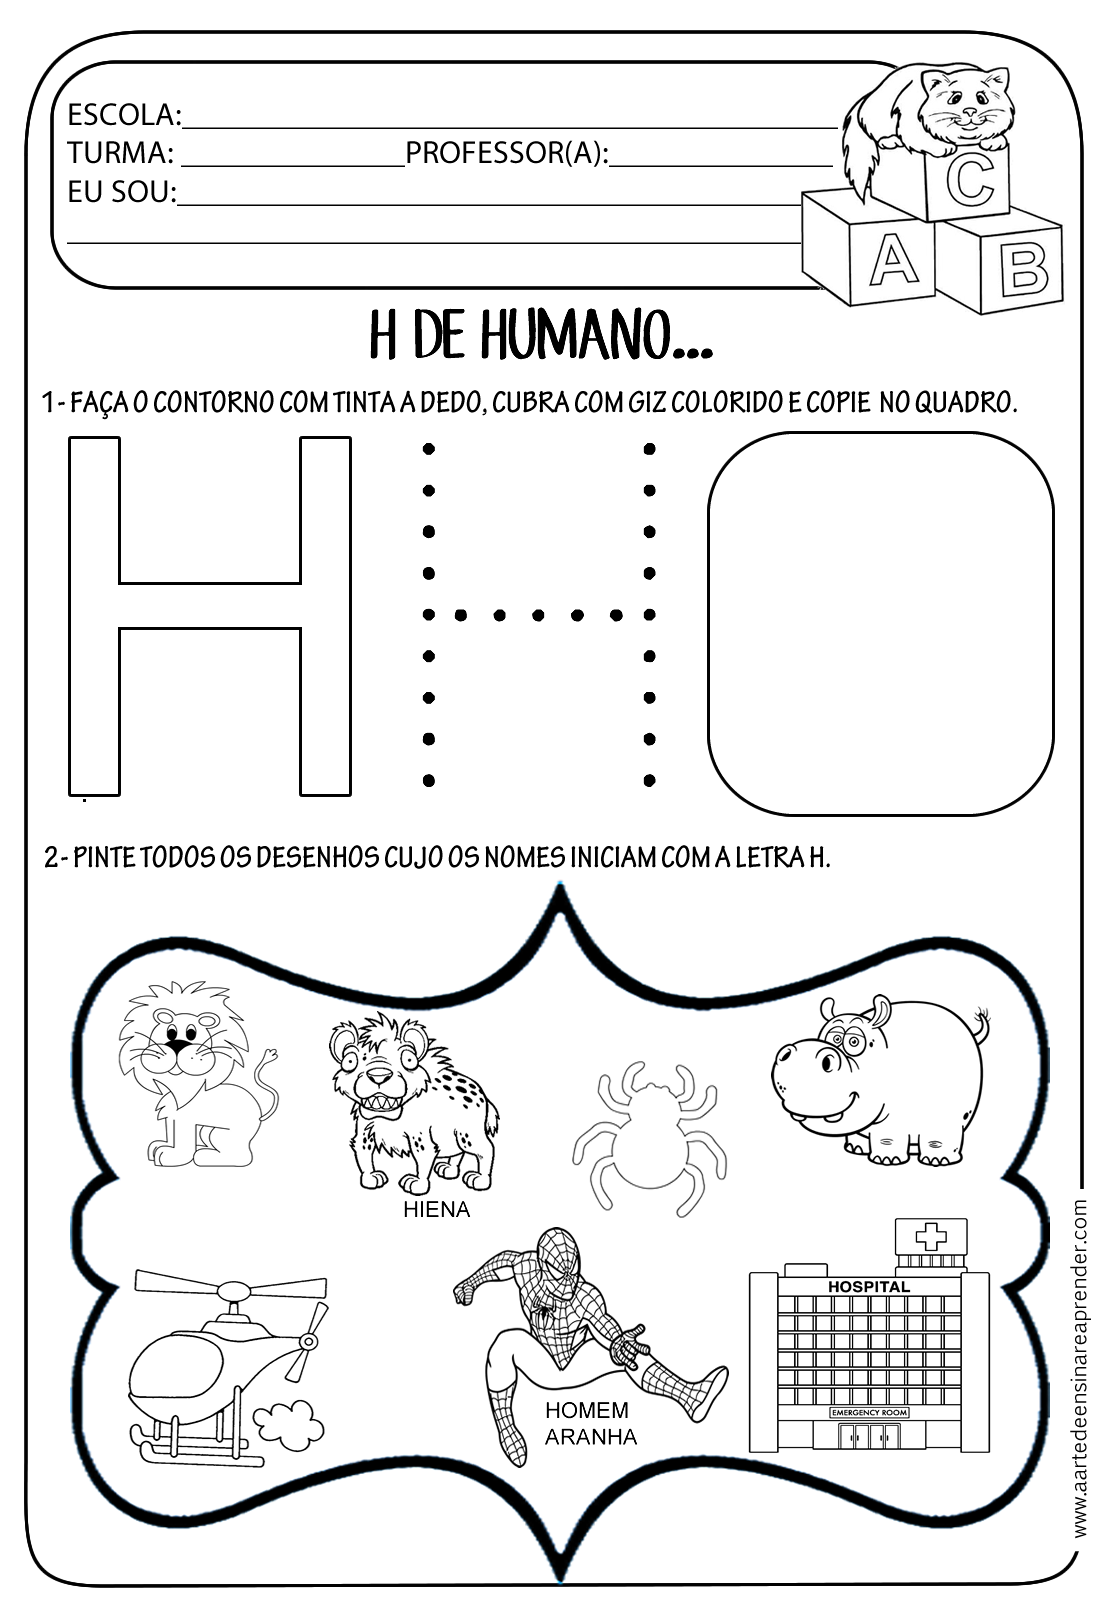 Atividade Pronta Letra H A Arte De Ensinar E Aprender